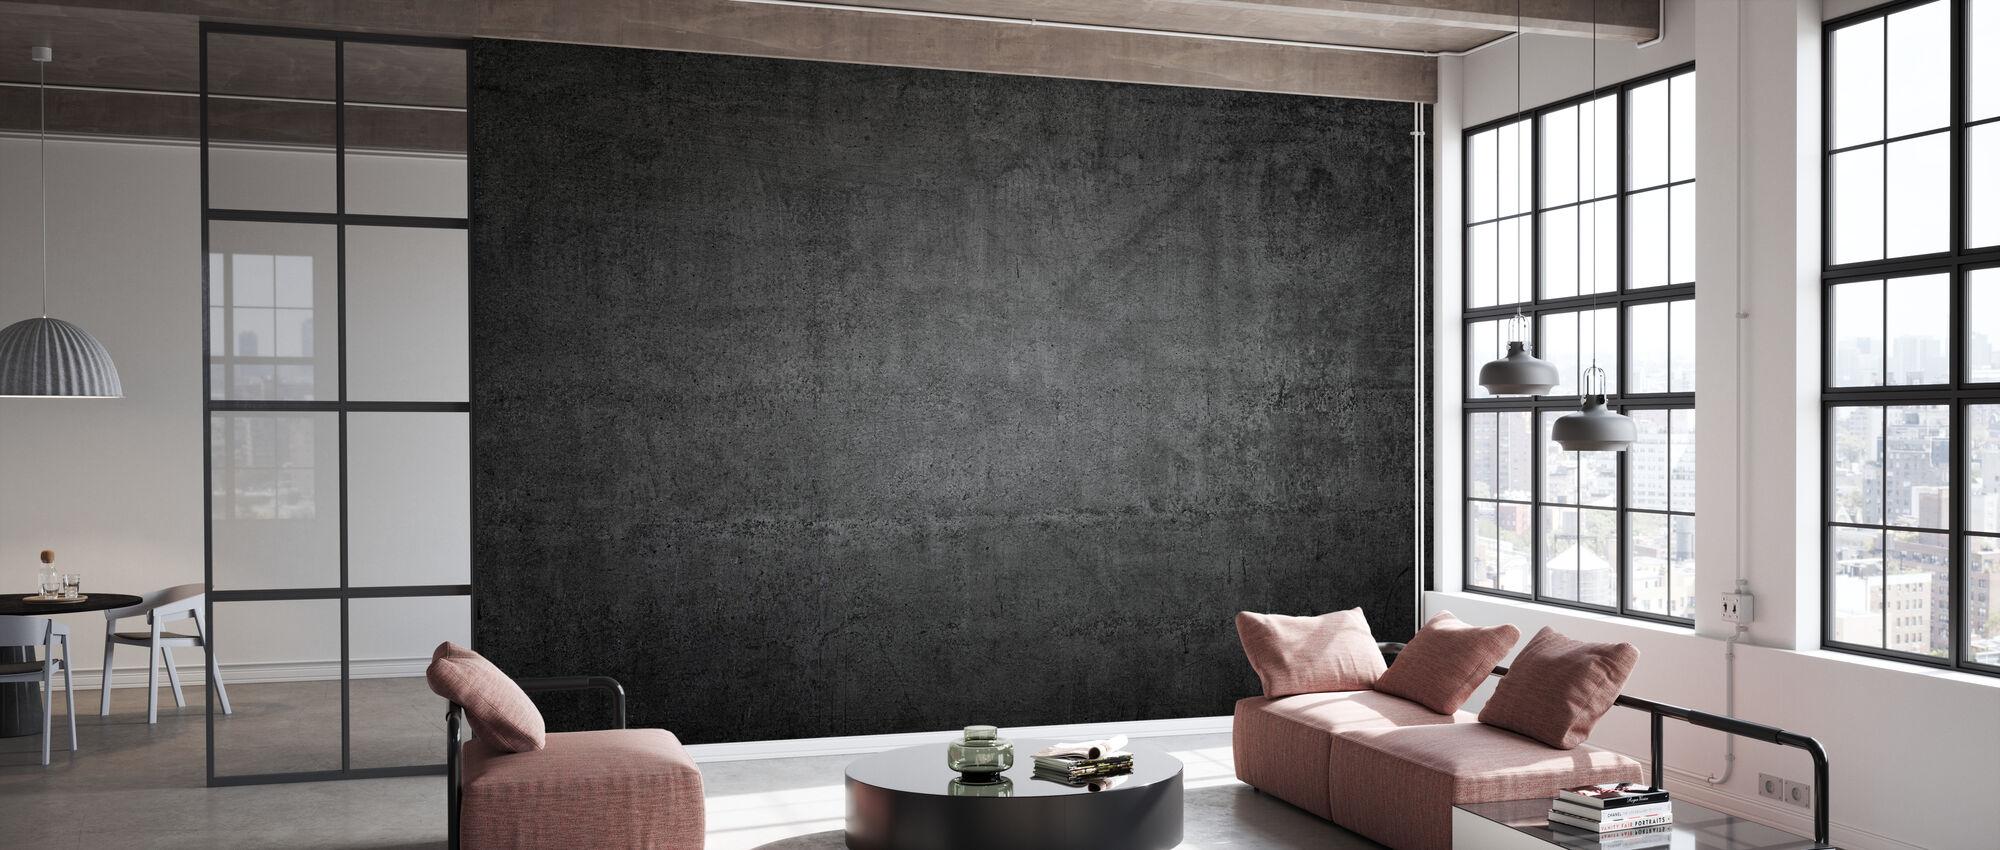 Concrete Wall - Wallpaper - Office